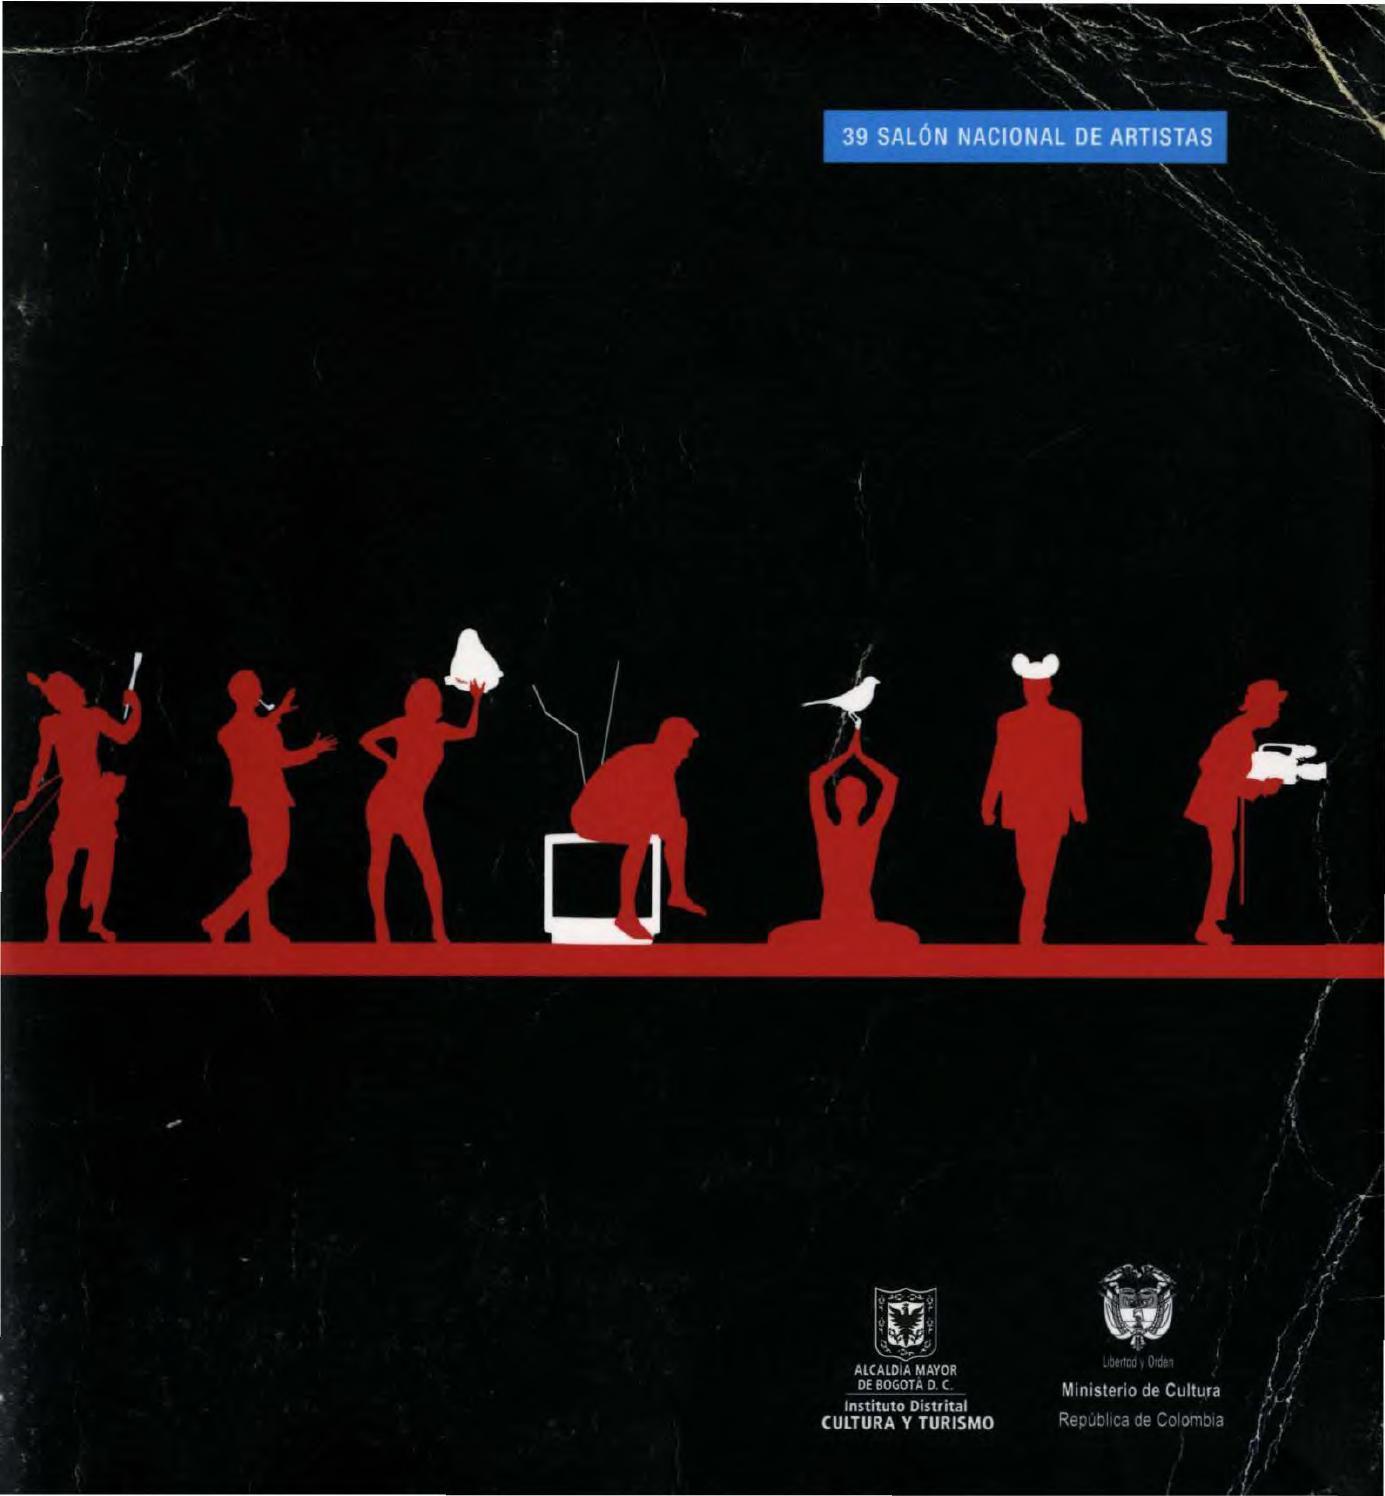 info for 83549 7a764 Catálogo del 39 Salón Nacional de Artistas by Artes Visuales Mincultura -  issuu